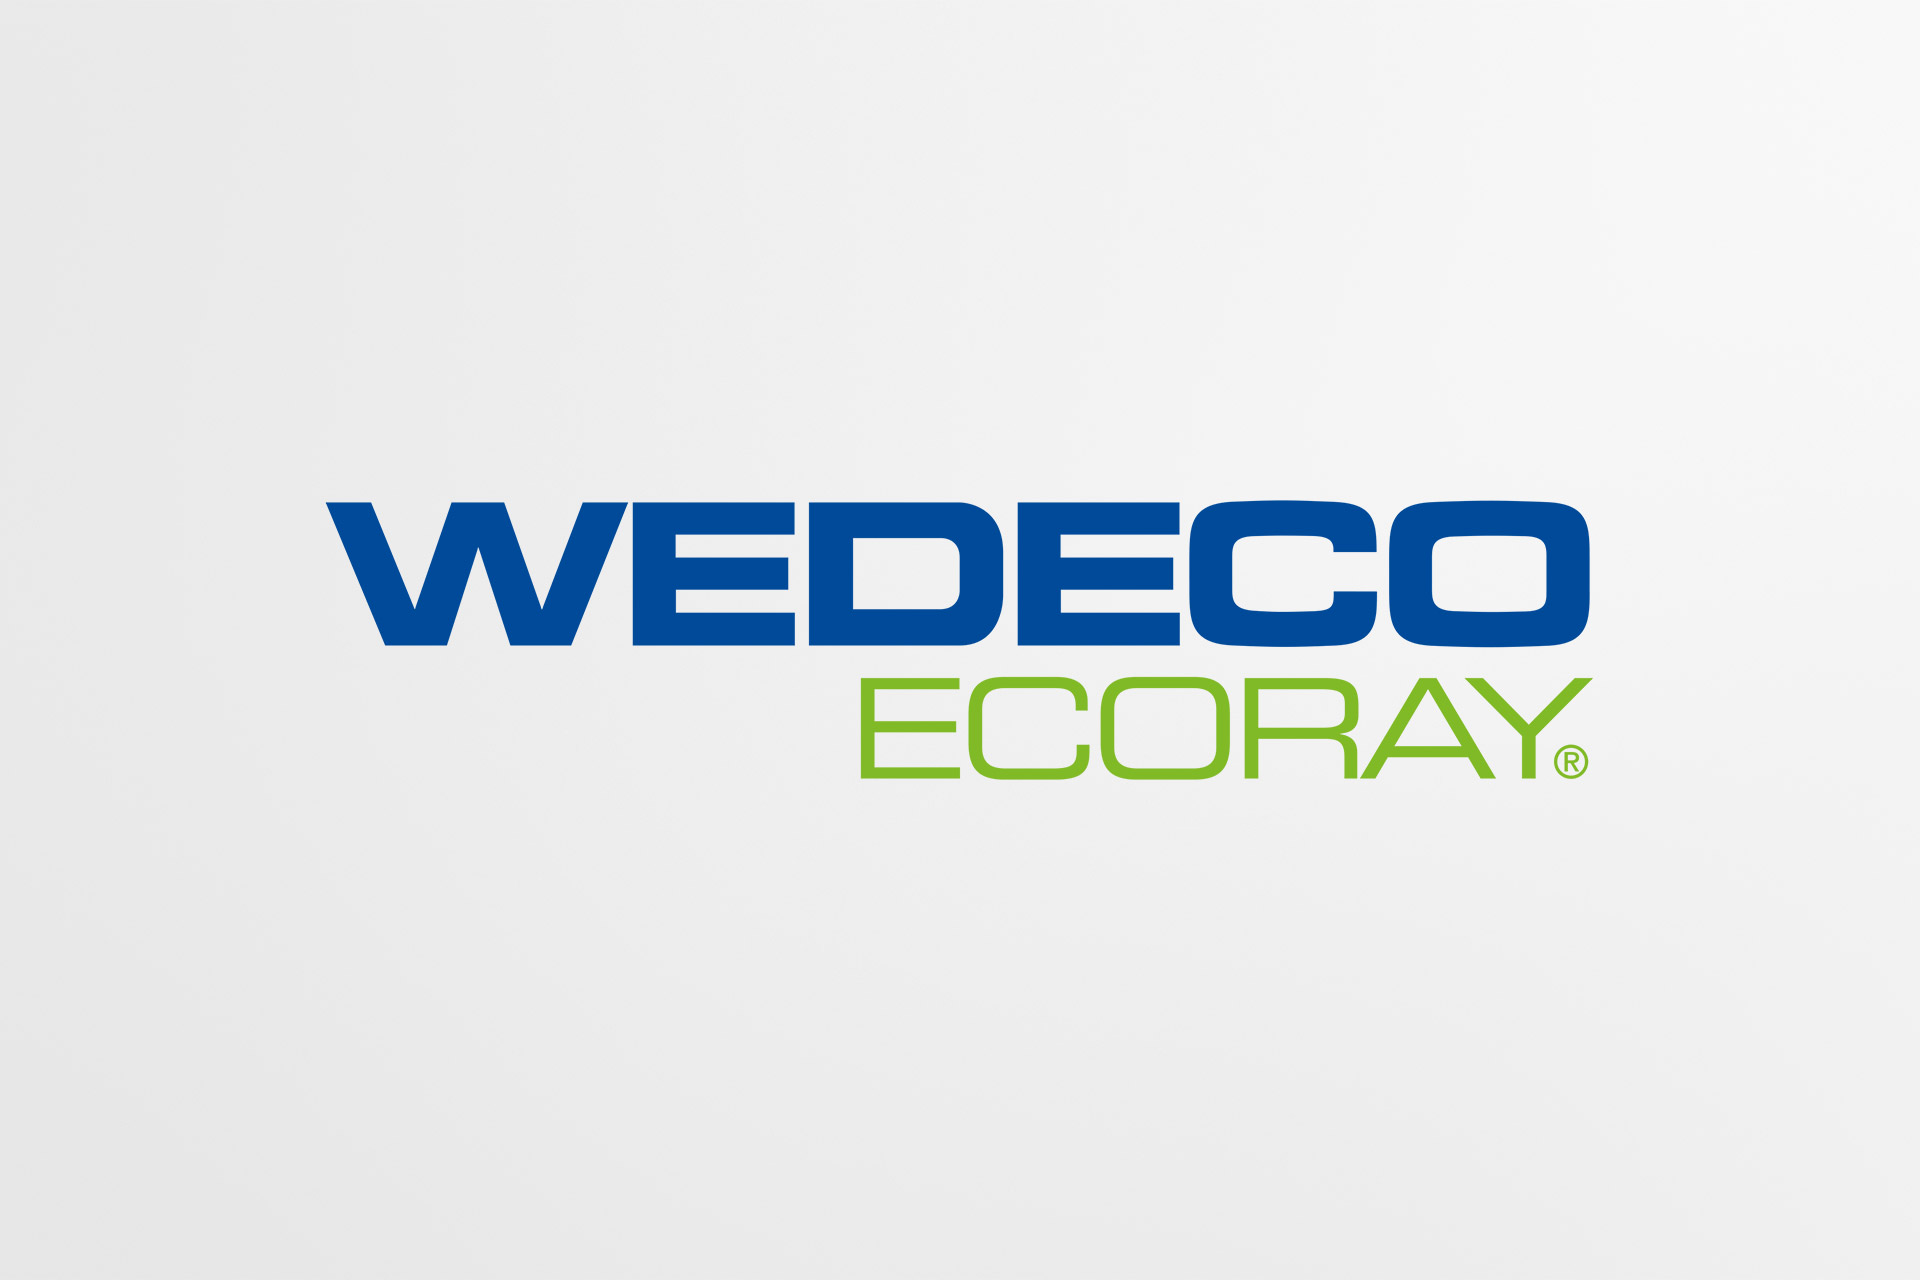 wedeco-verpackungsdesign logo design